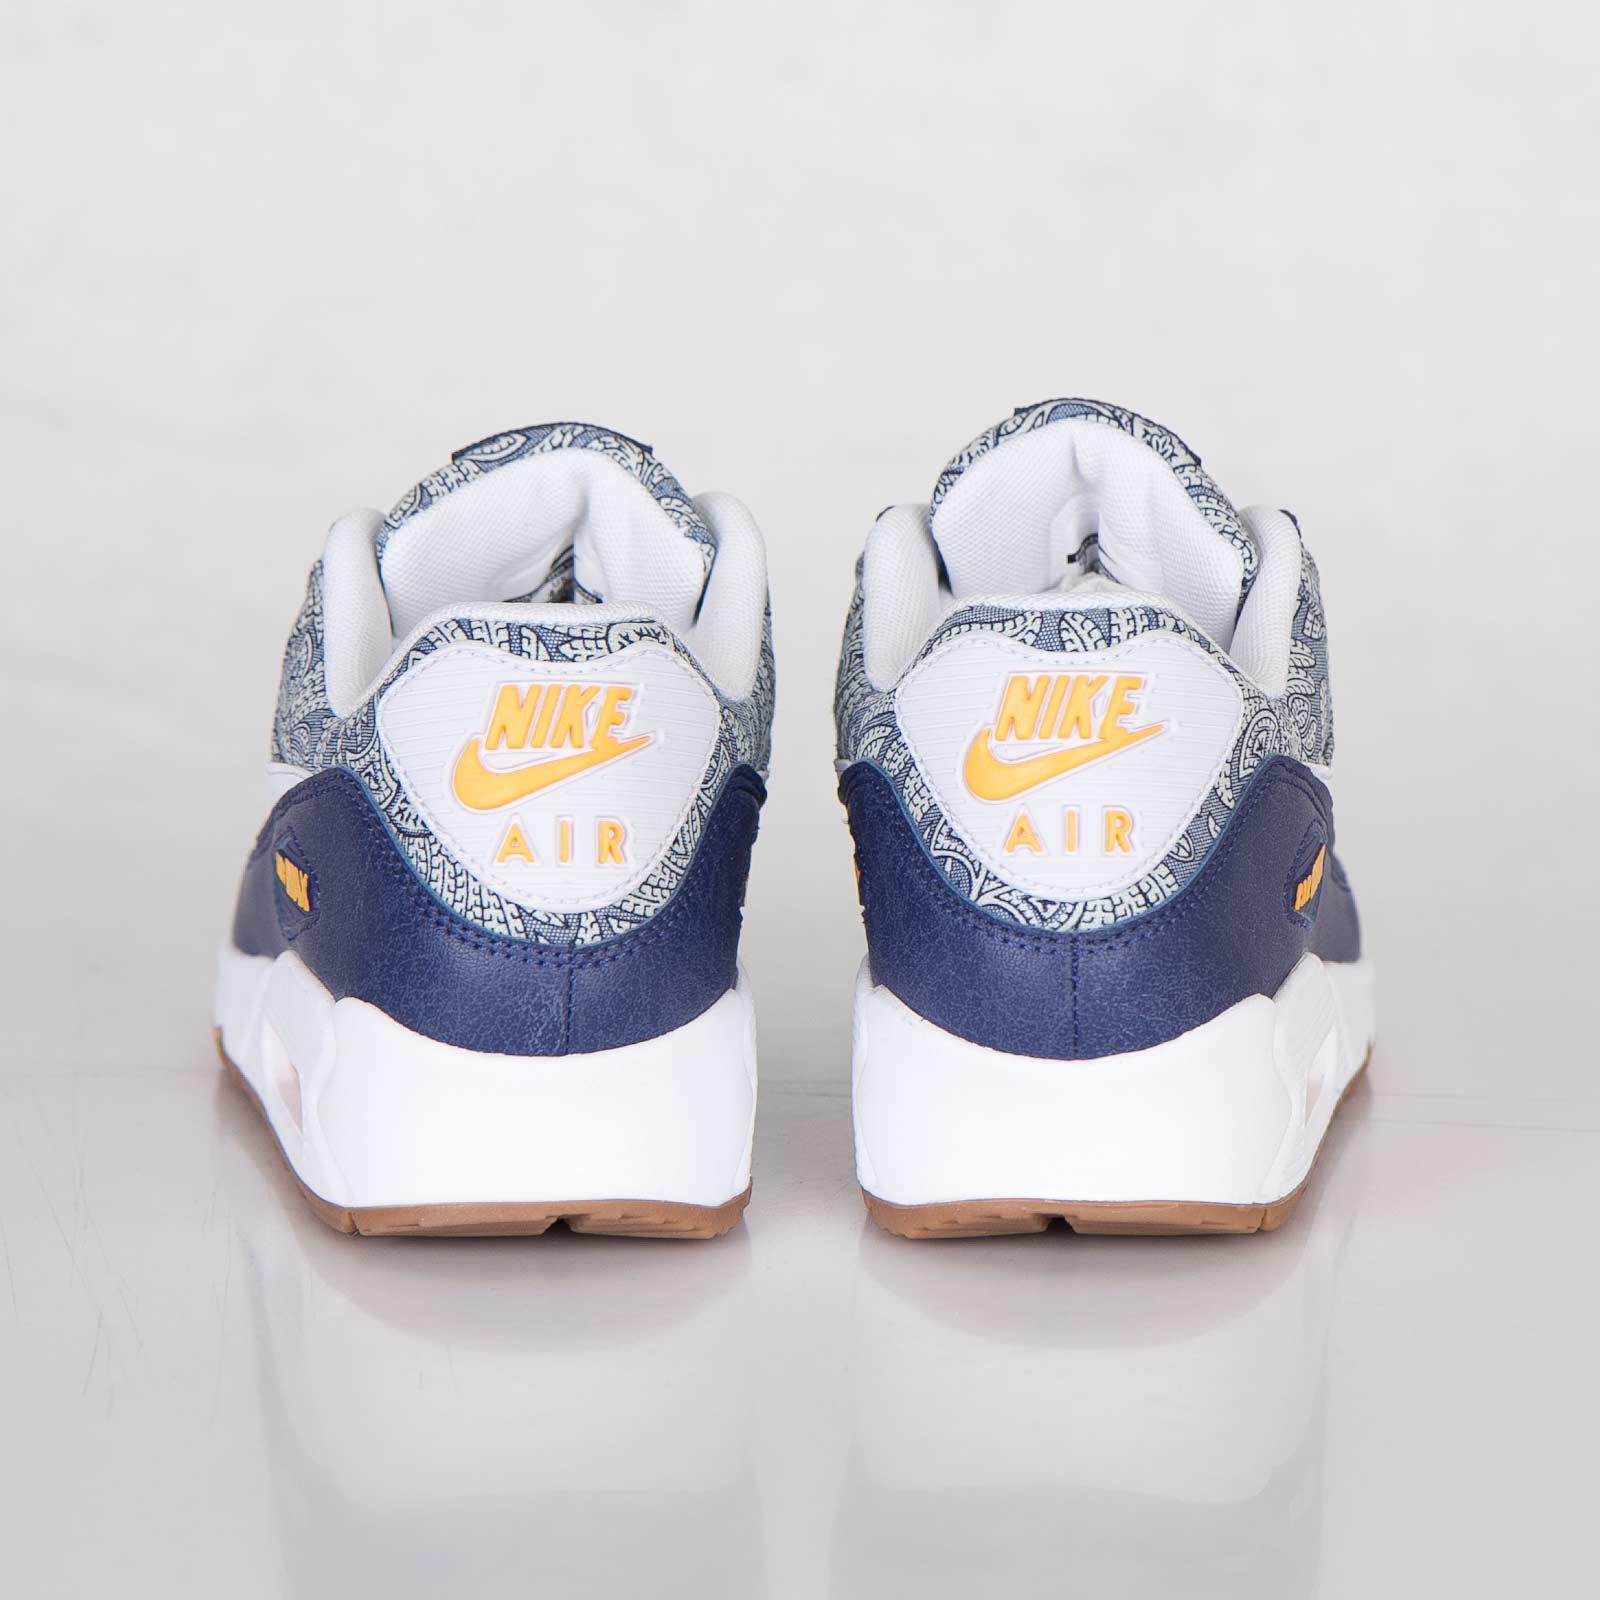 huge discount acff0 e8281 Nike Wmns Air Max 90 Liberty QS - 654846-400 - Sneakersnstuff   sneakers    streetwear online since 1999